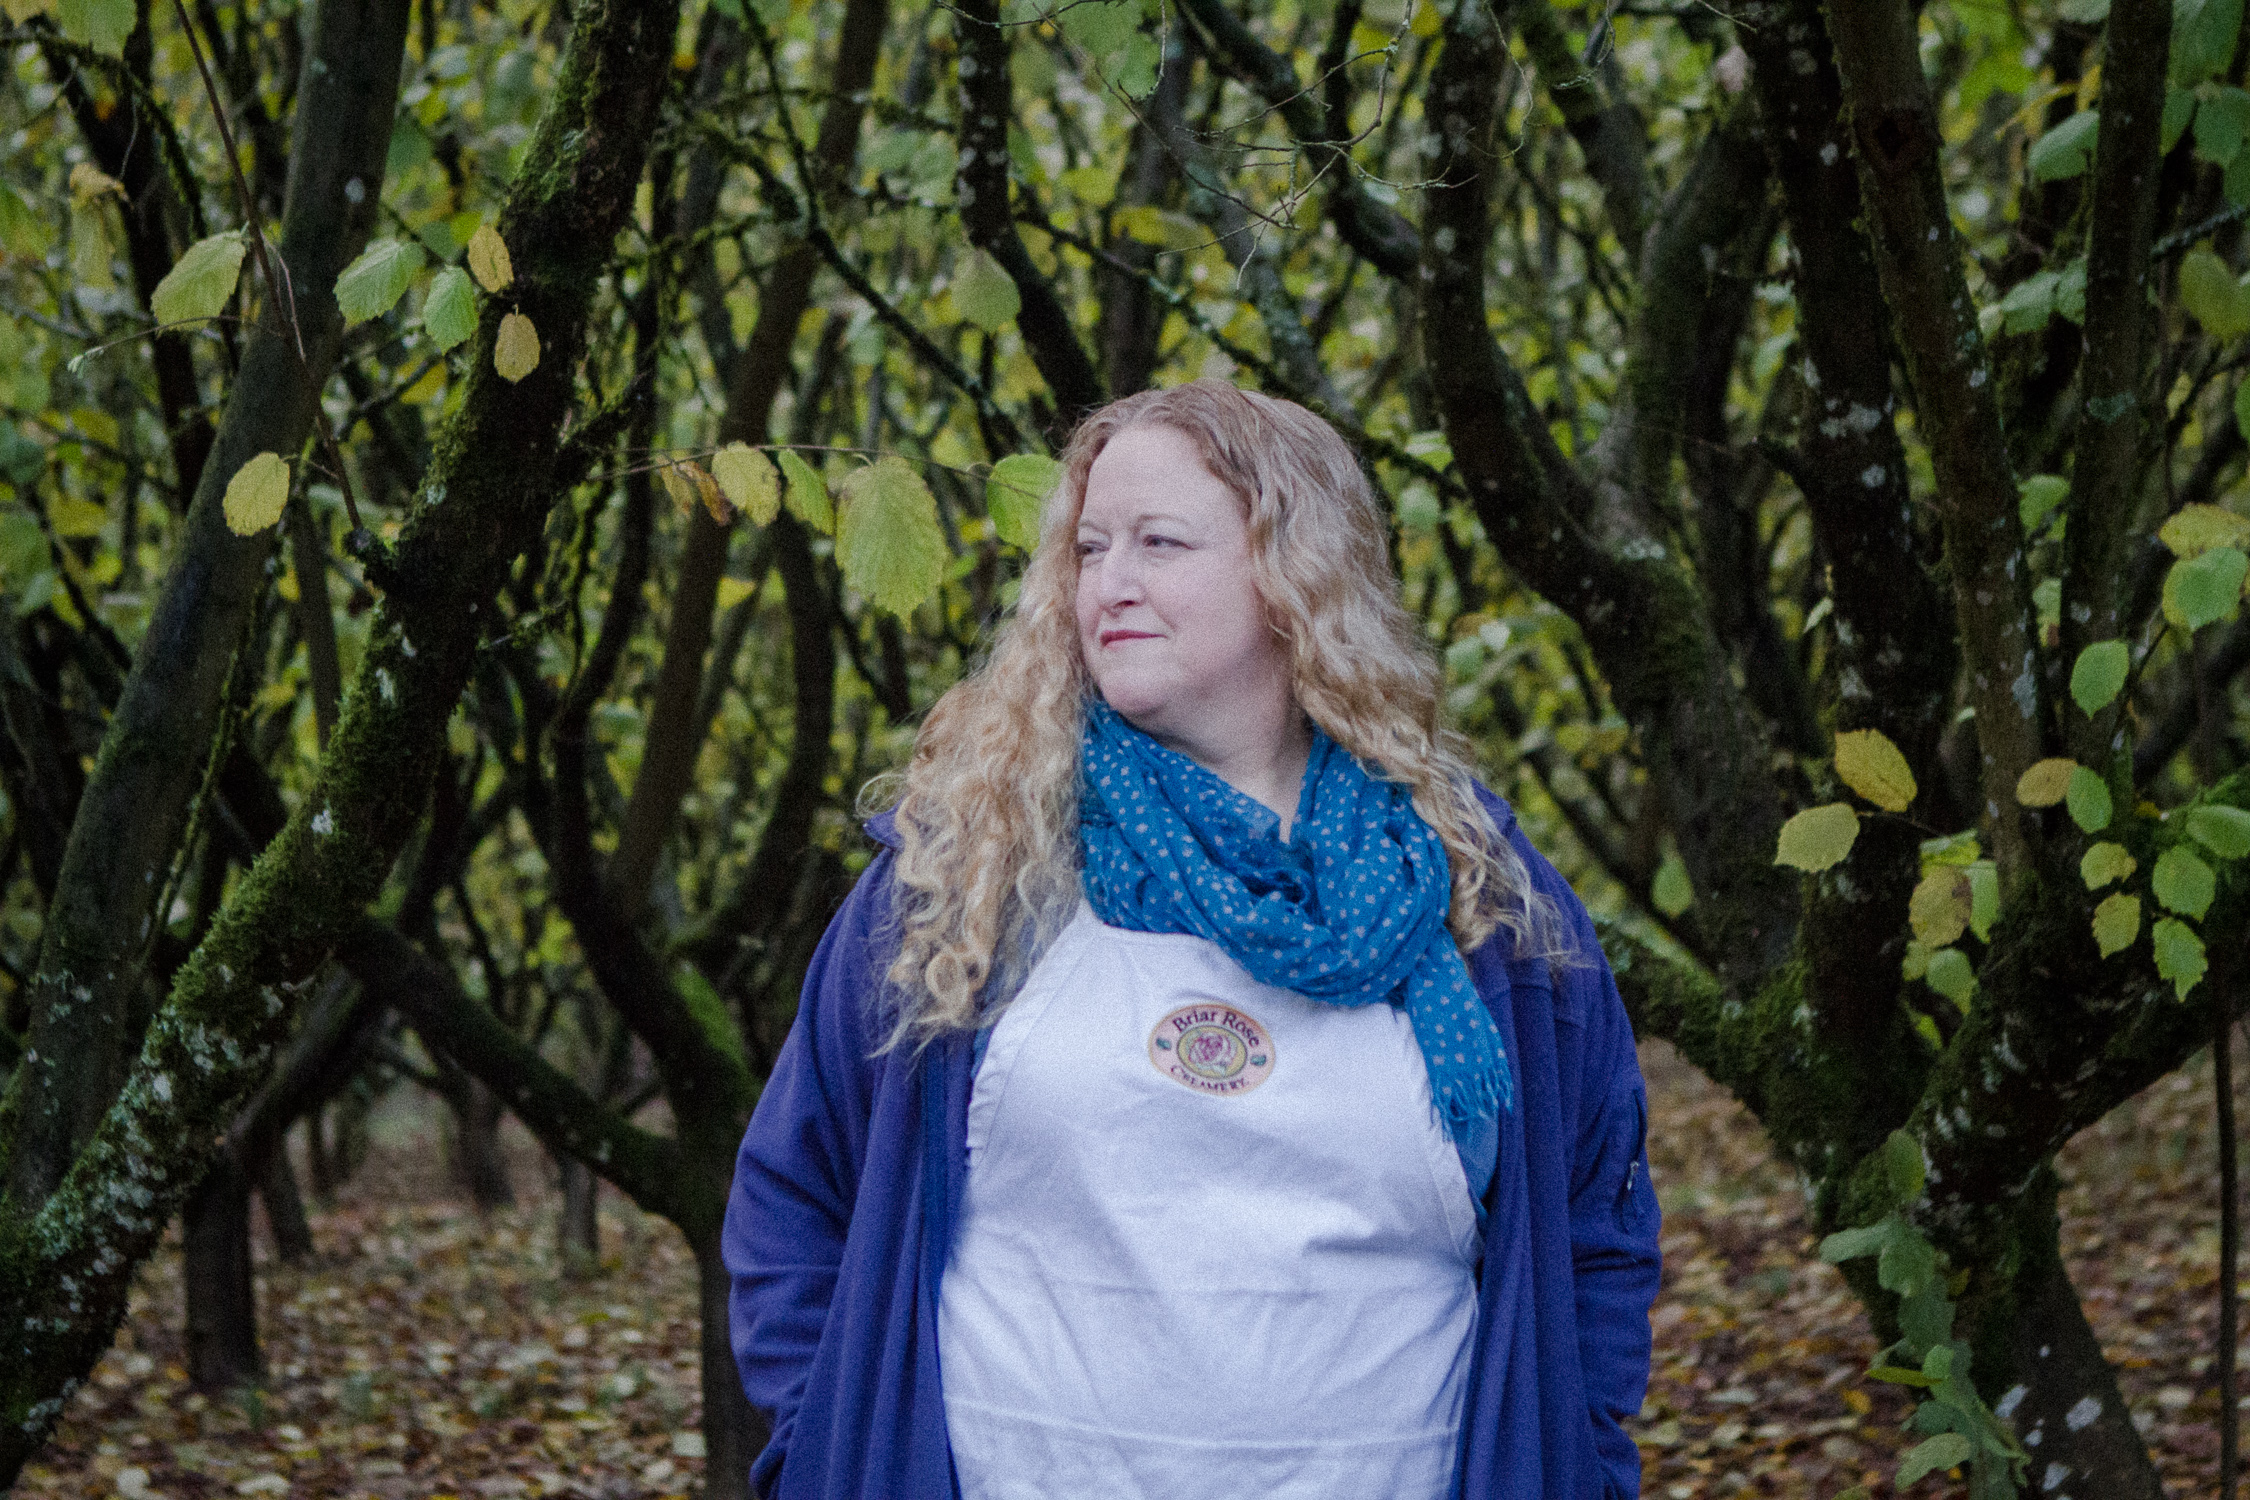 Cheesemaker Sarah Marcus